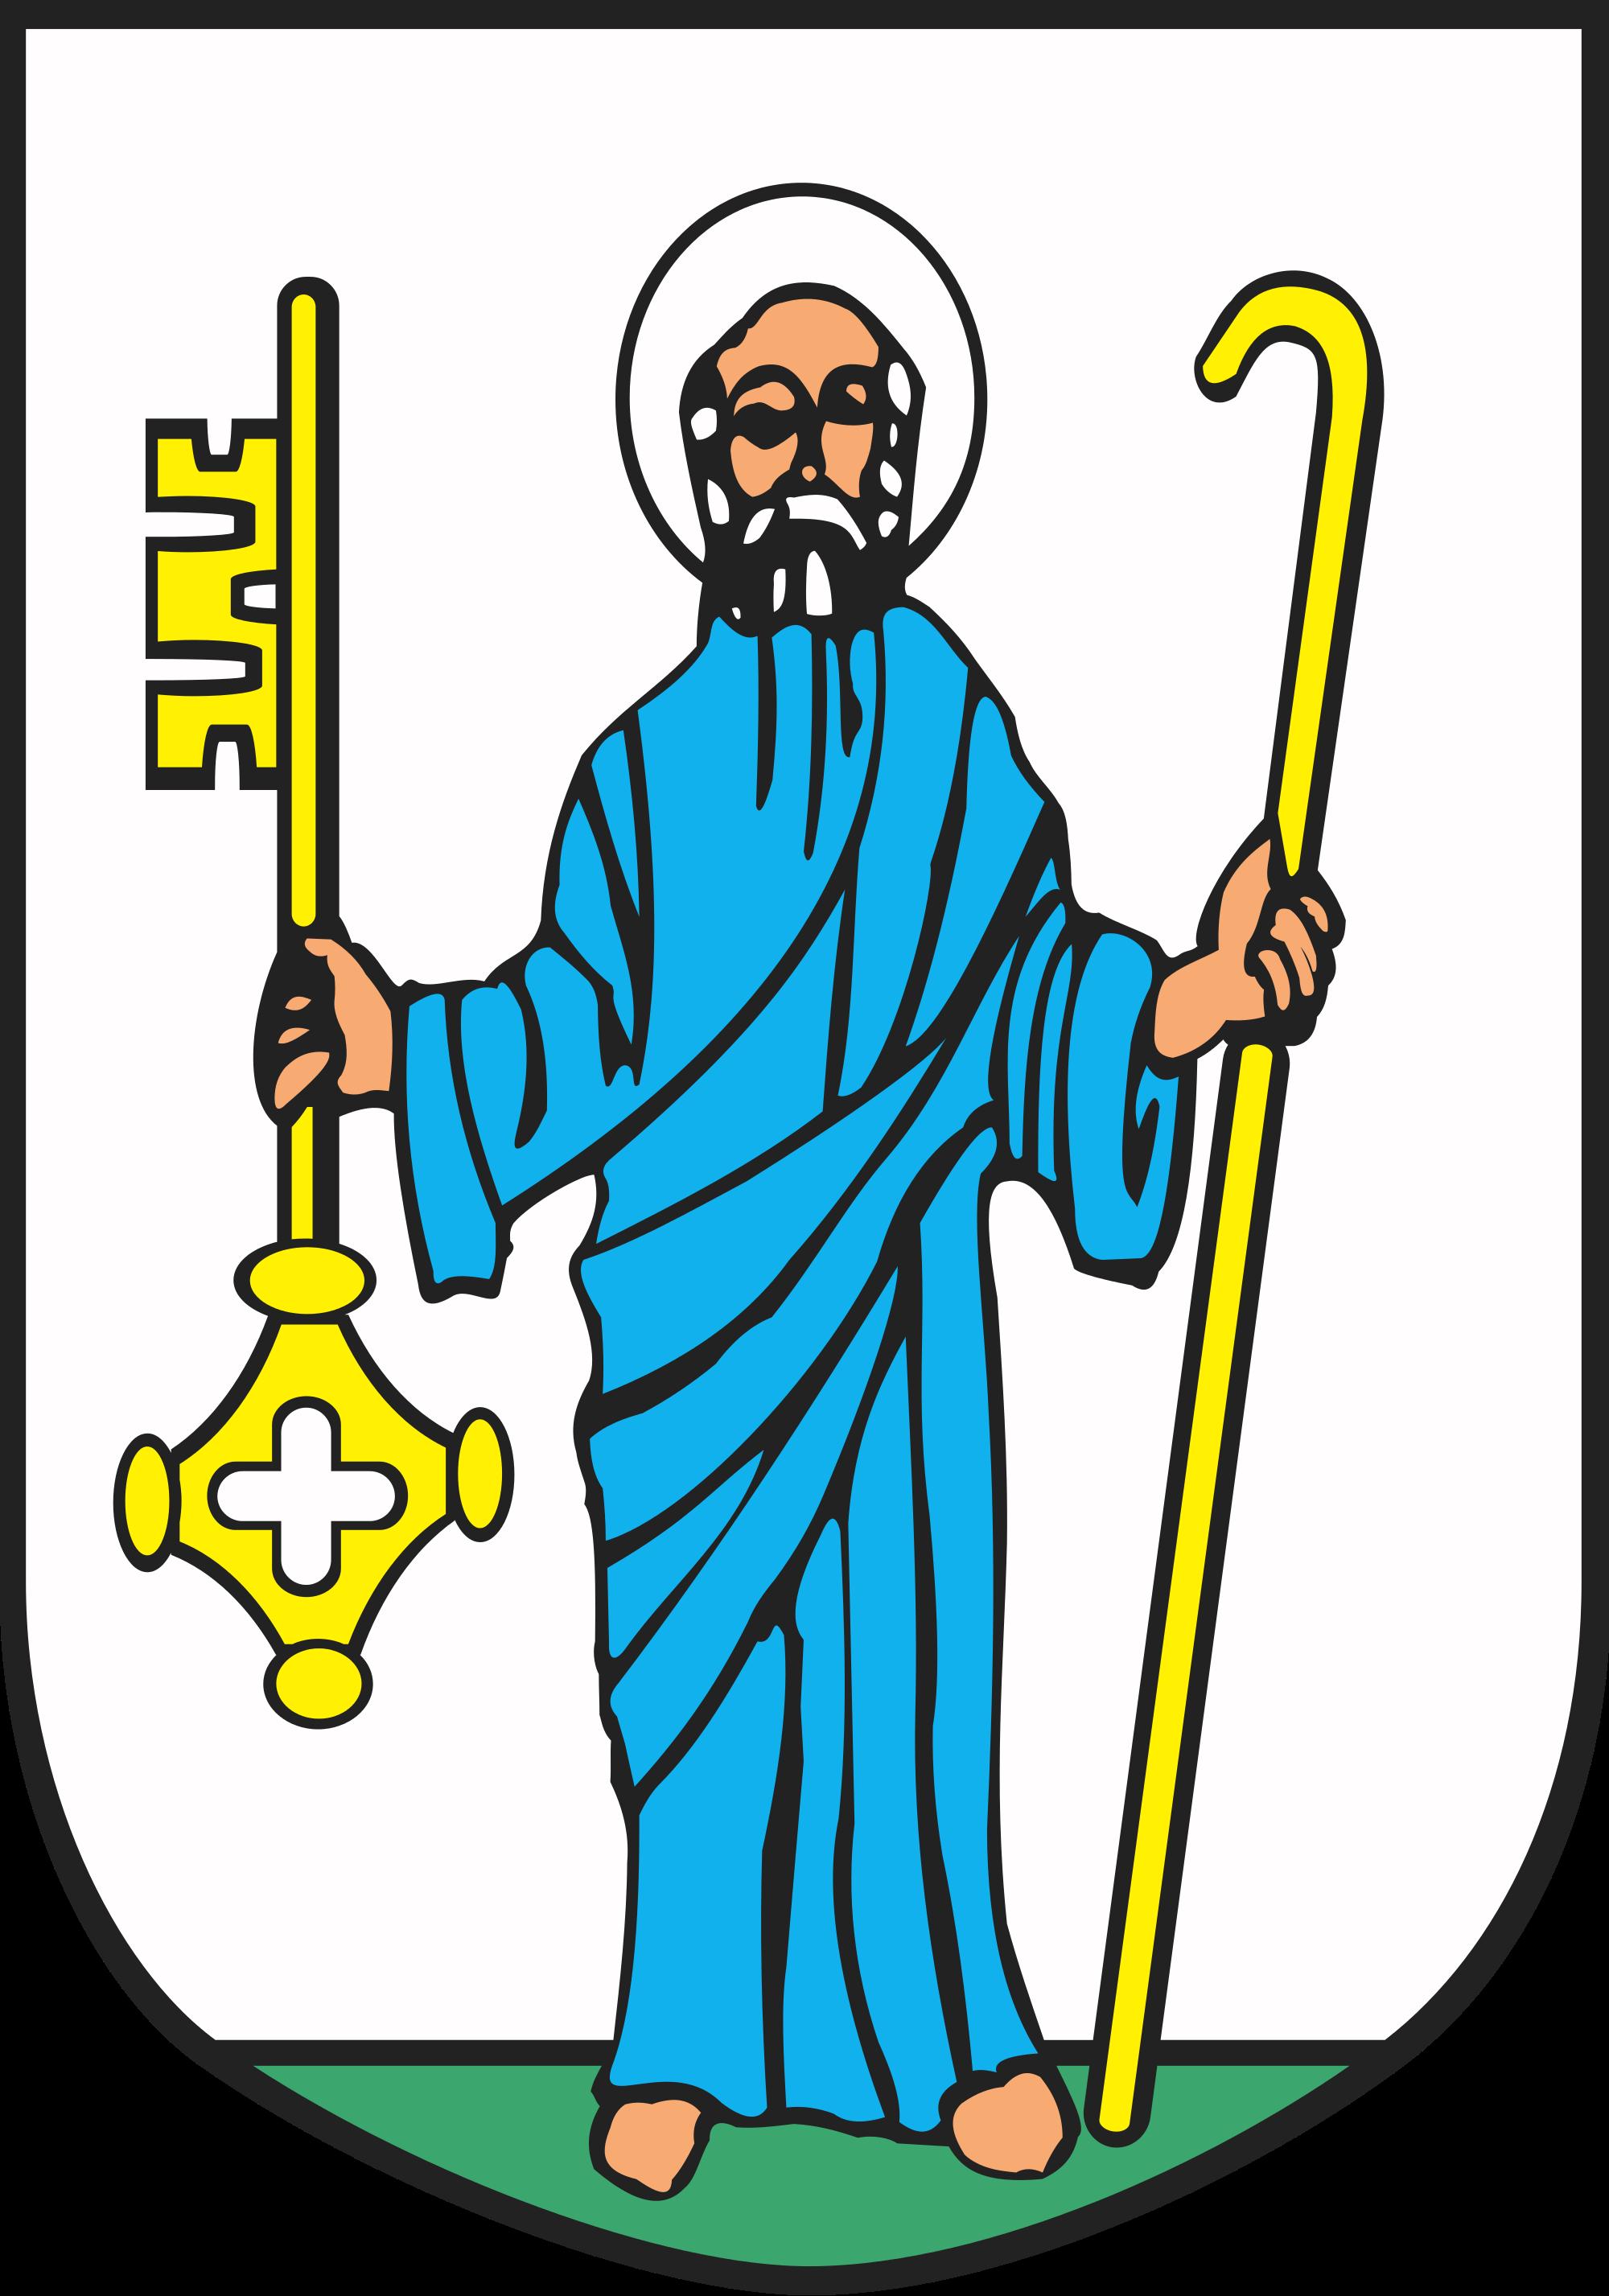 File:POL Olsztynek COA.svg.